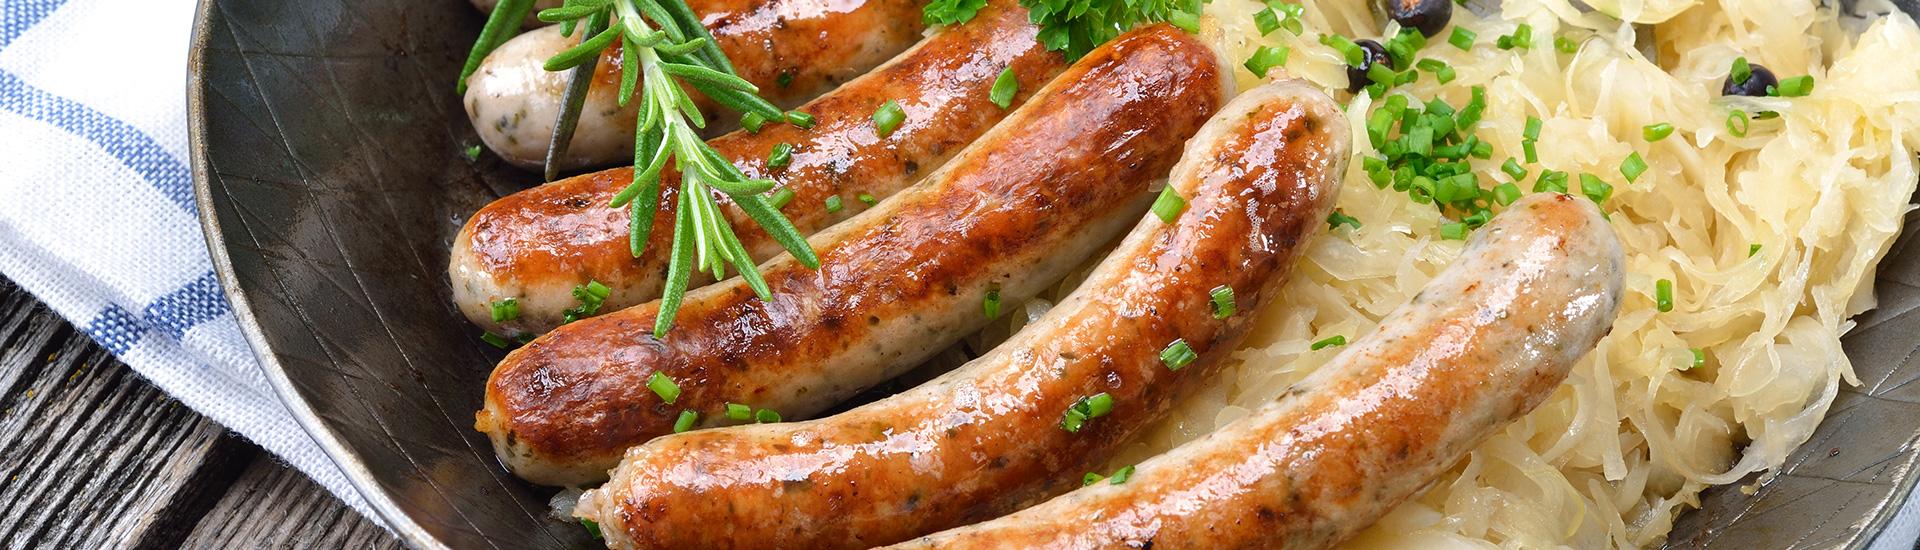 Bavarian food Germany